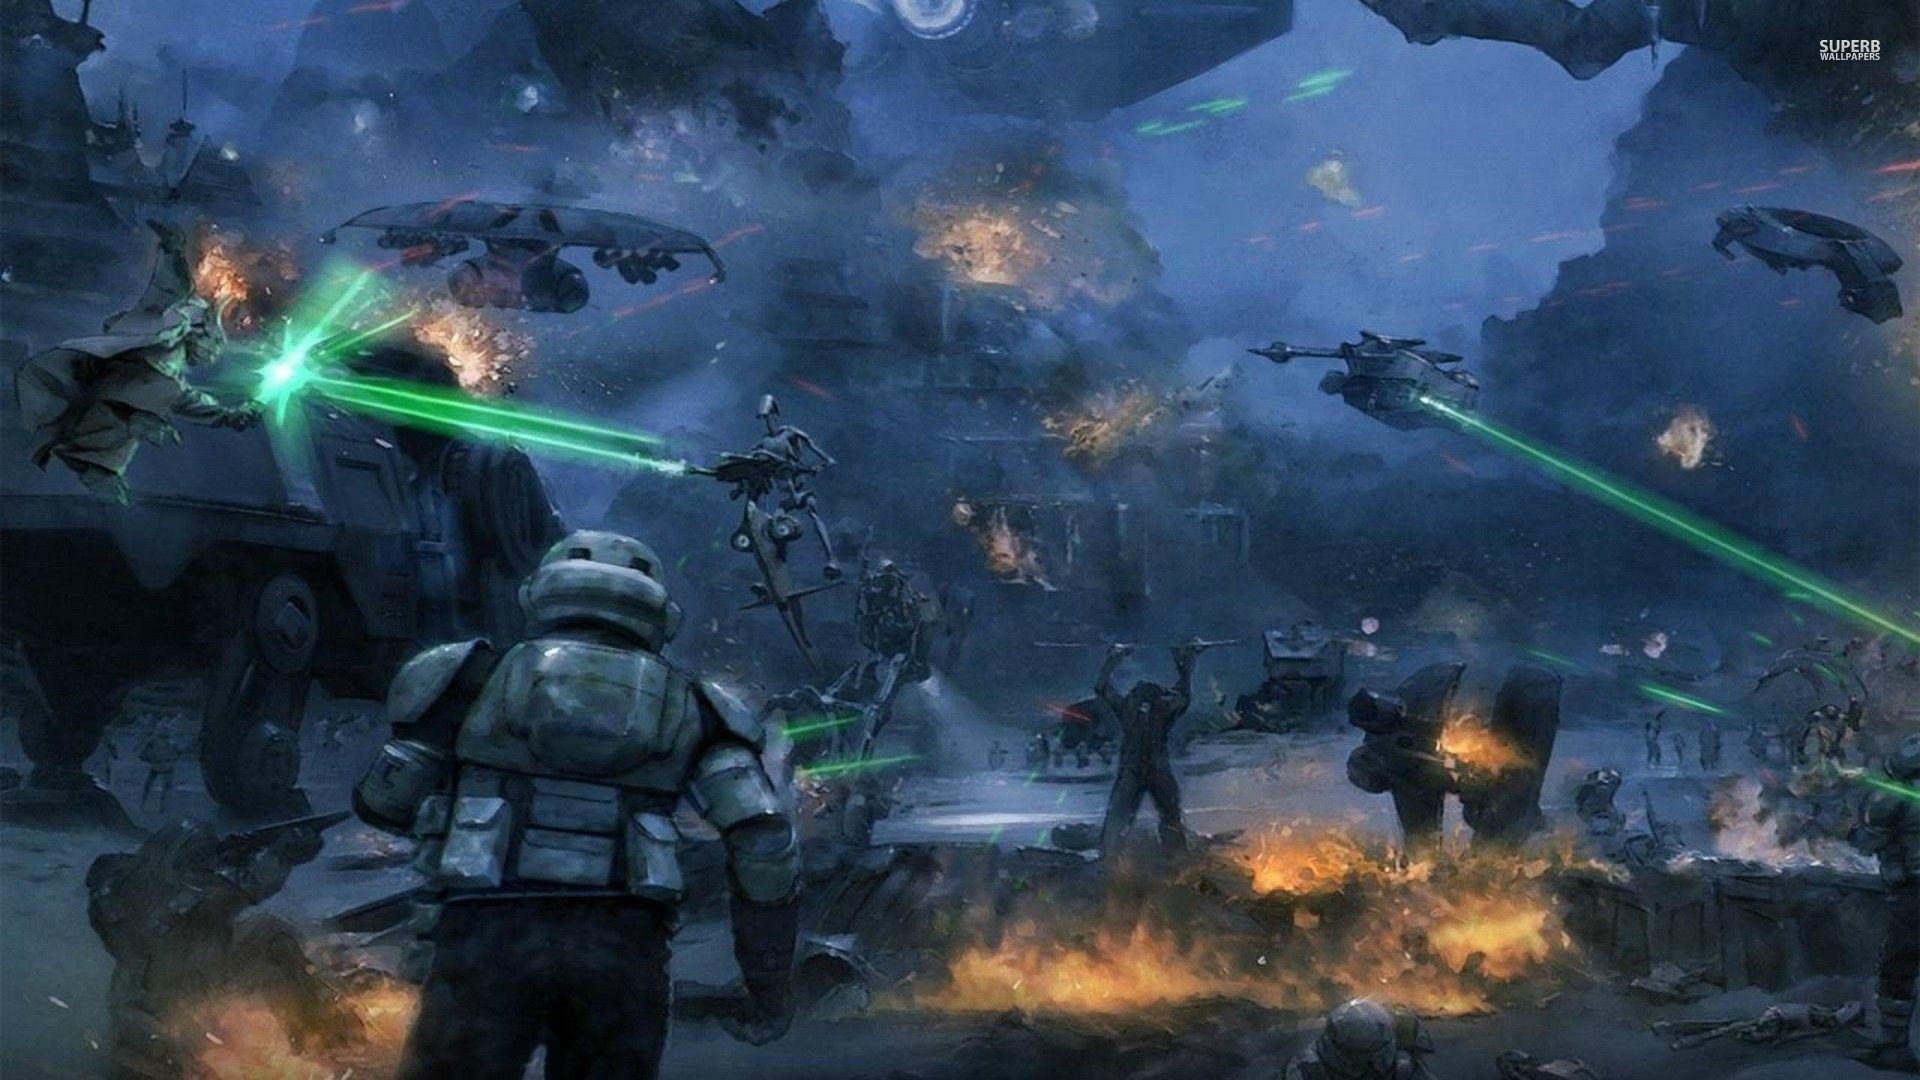 Star Wars Clone Troopers Wallpapers Top Free Star Wars Clone Troopers Backgrounds Wallpaperaccess